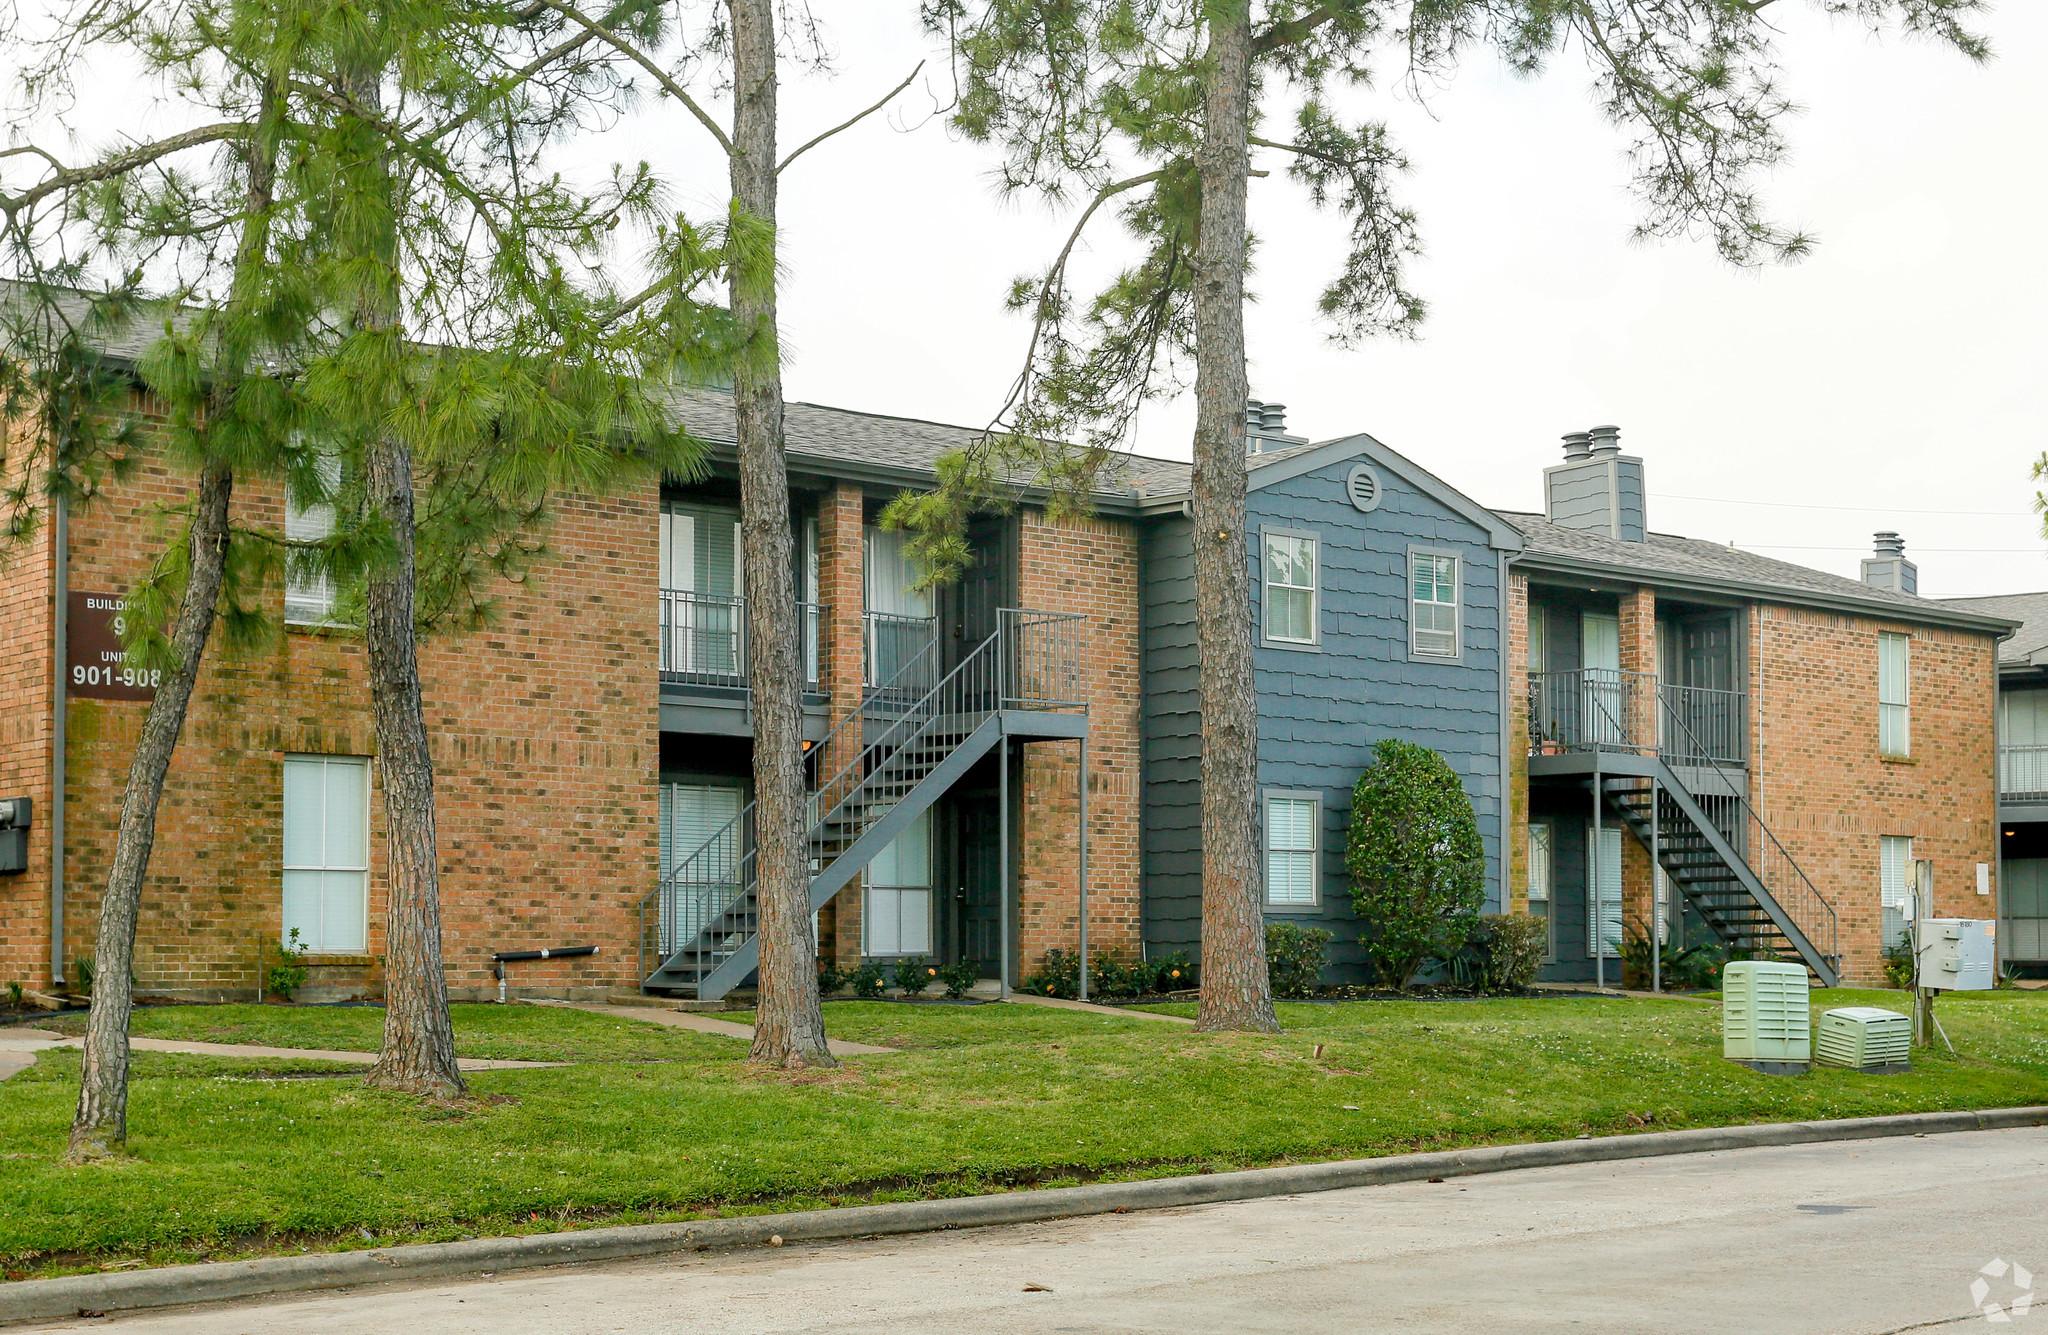 verandas-at-bear-creek-apartments-houston-tx-building-photo.jpg